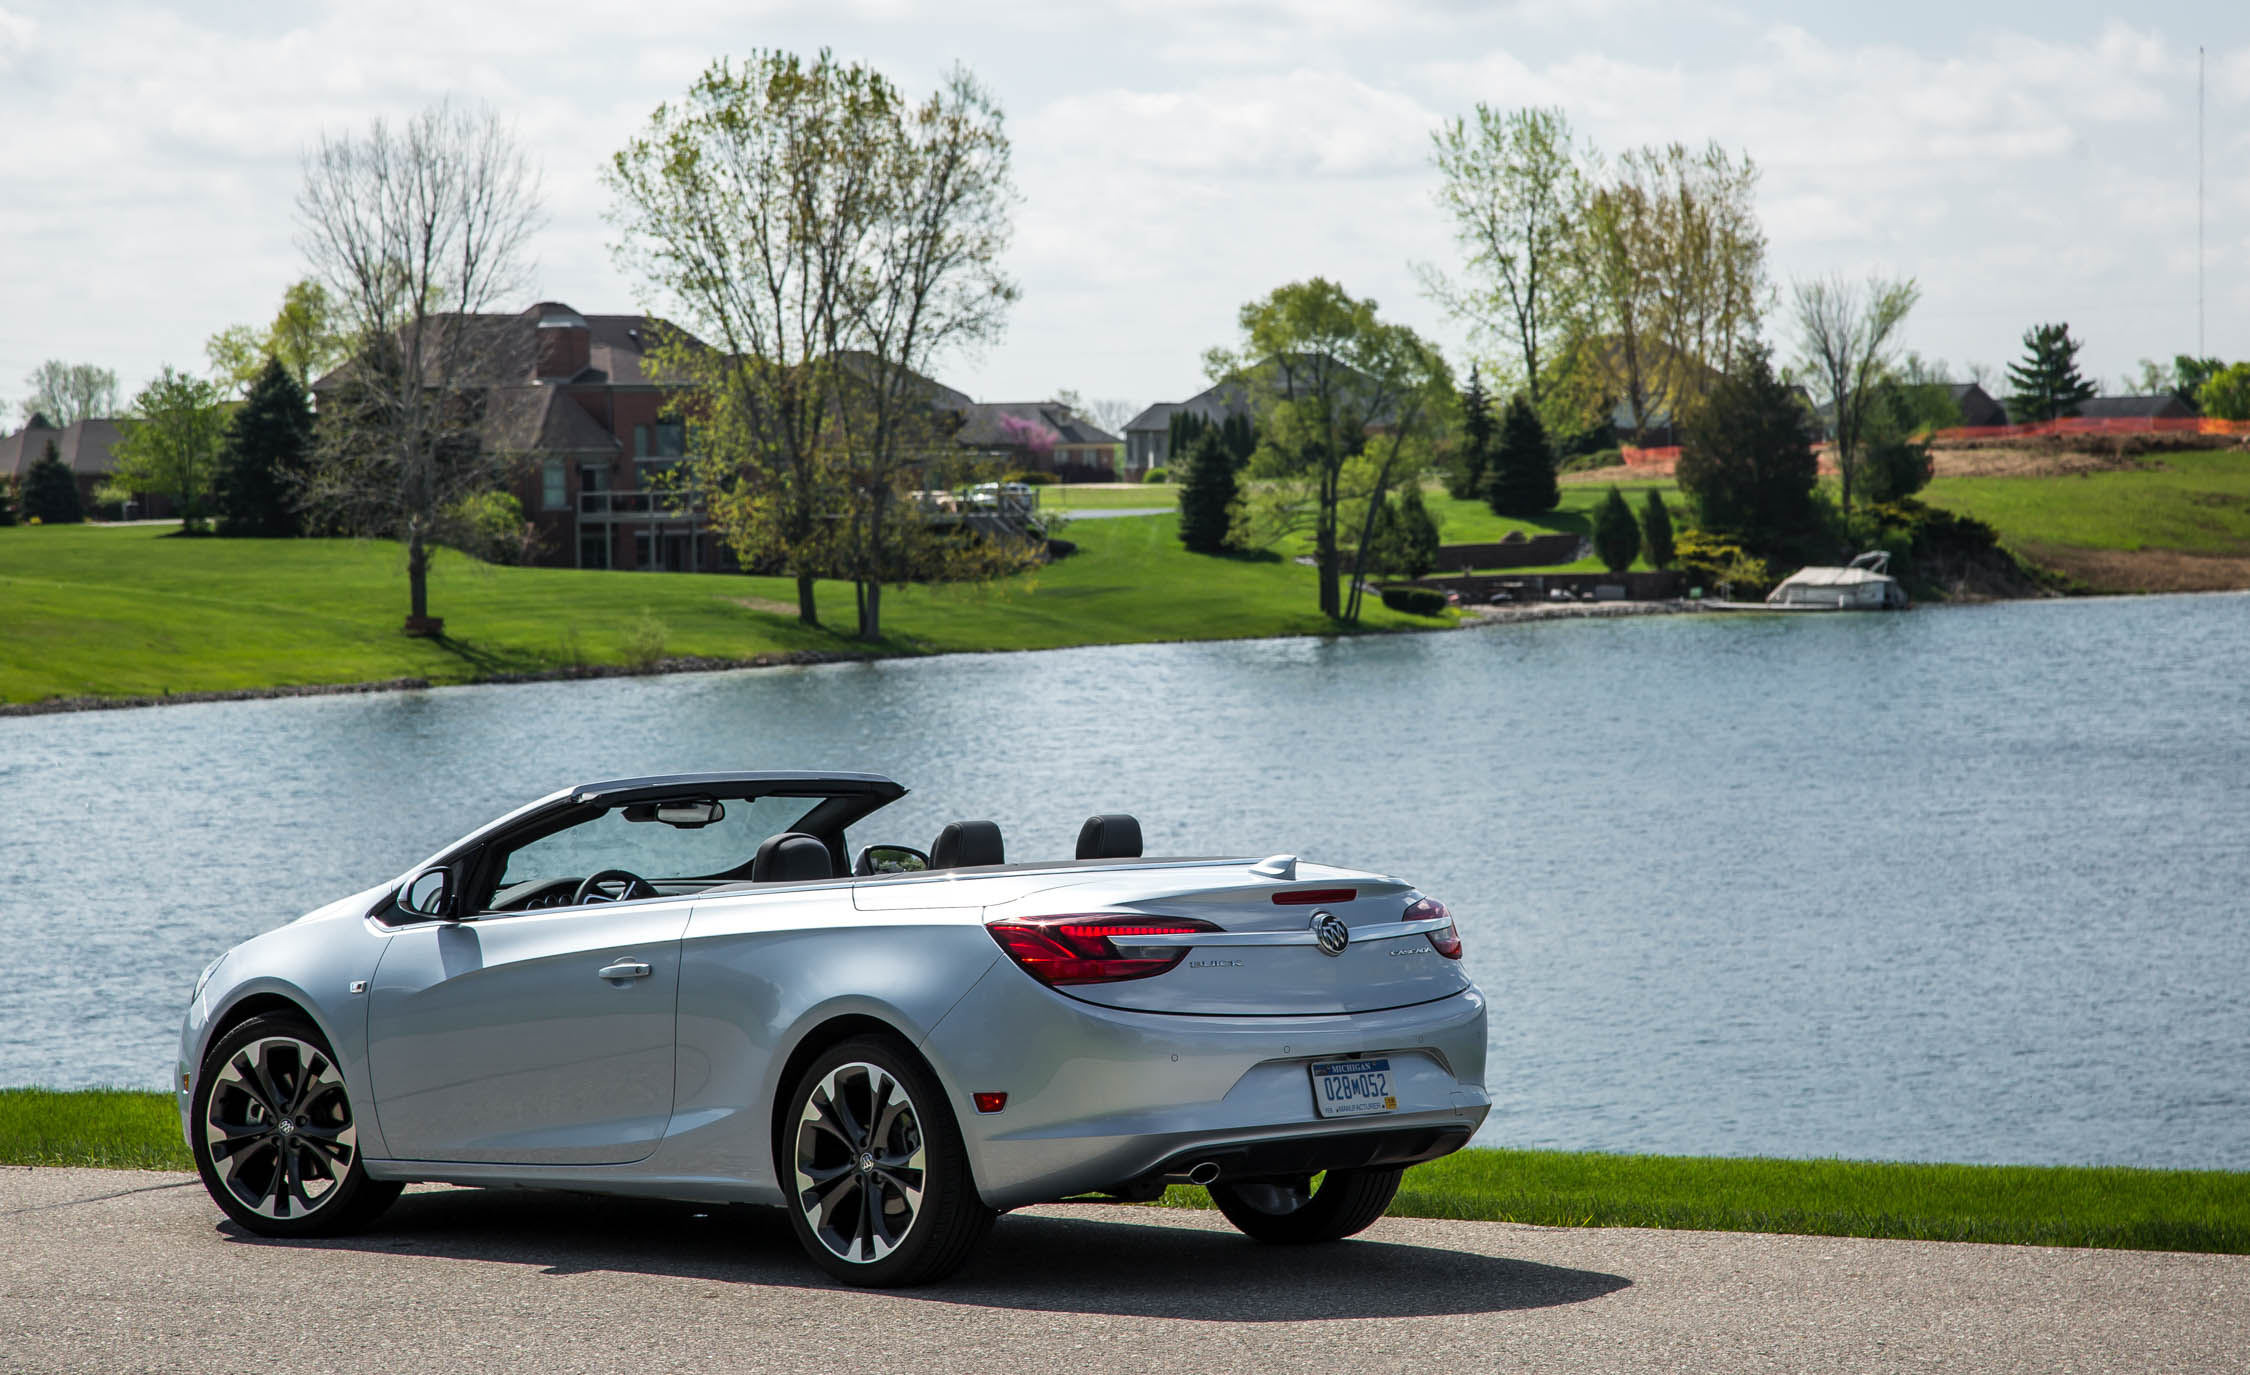 2016 Buick Cascada Premium (View 3 of 24)